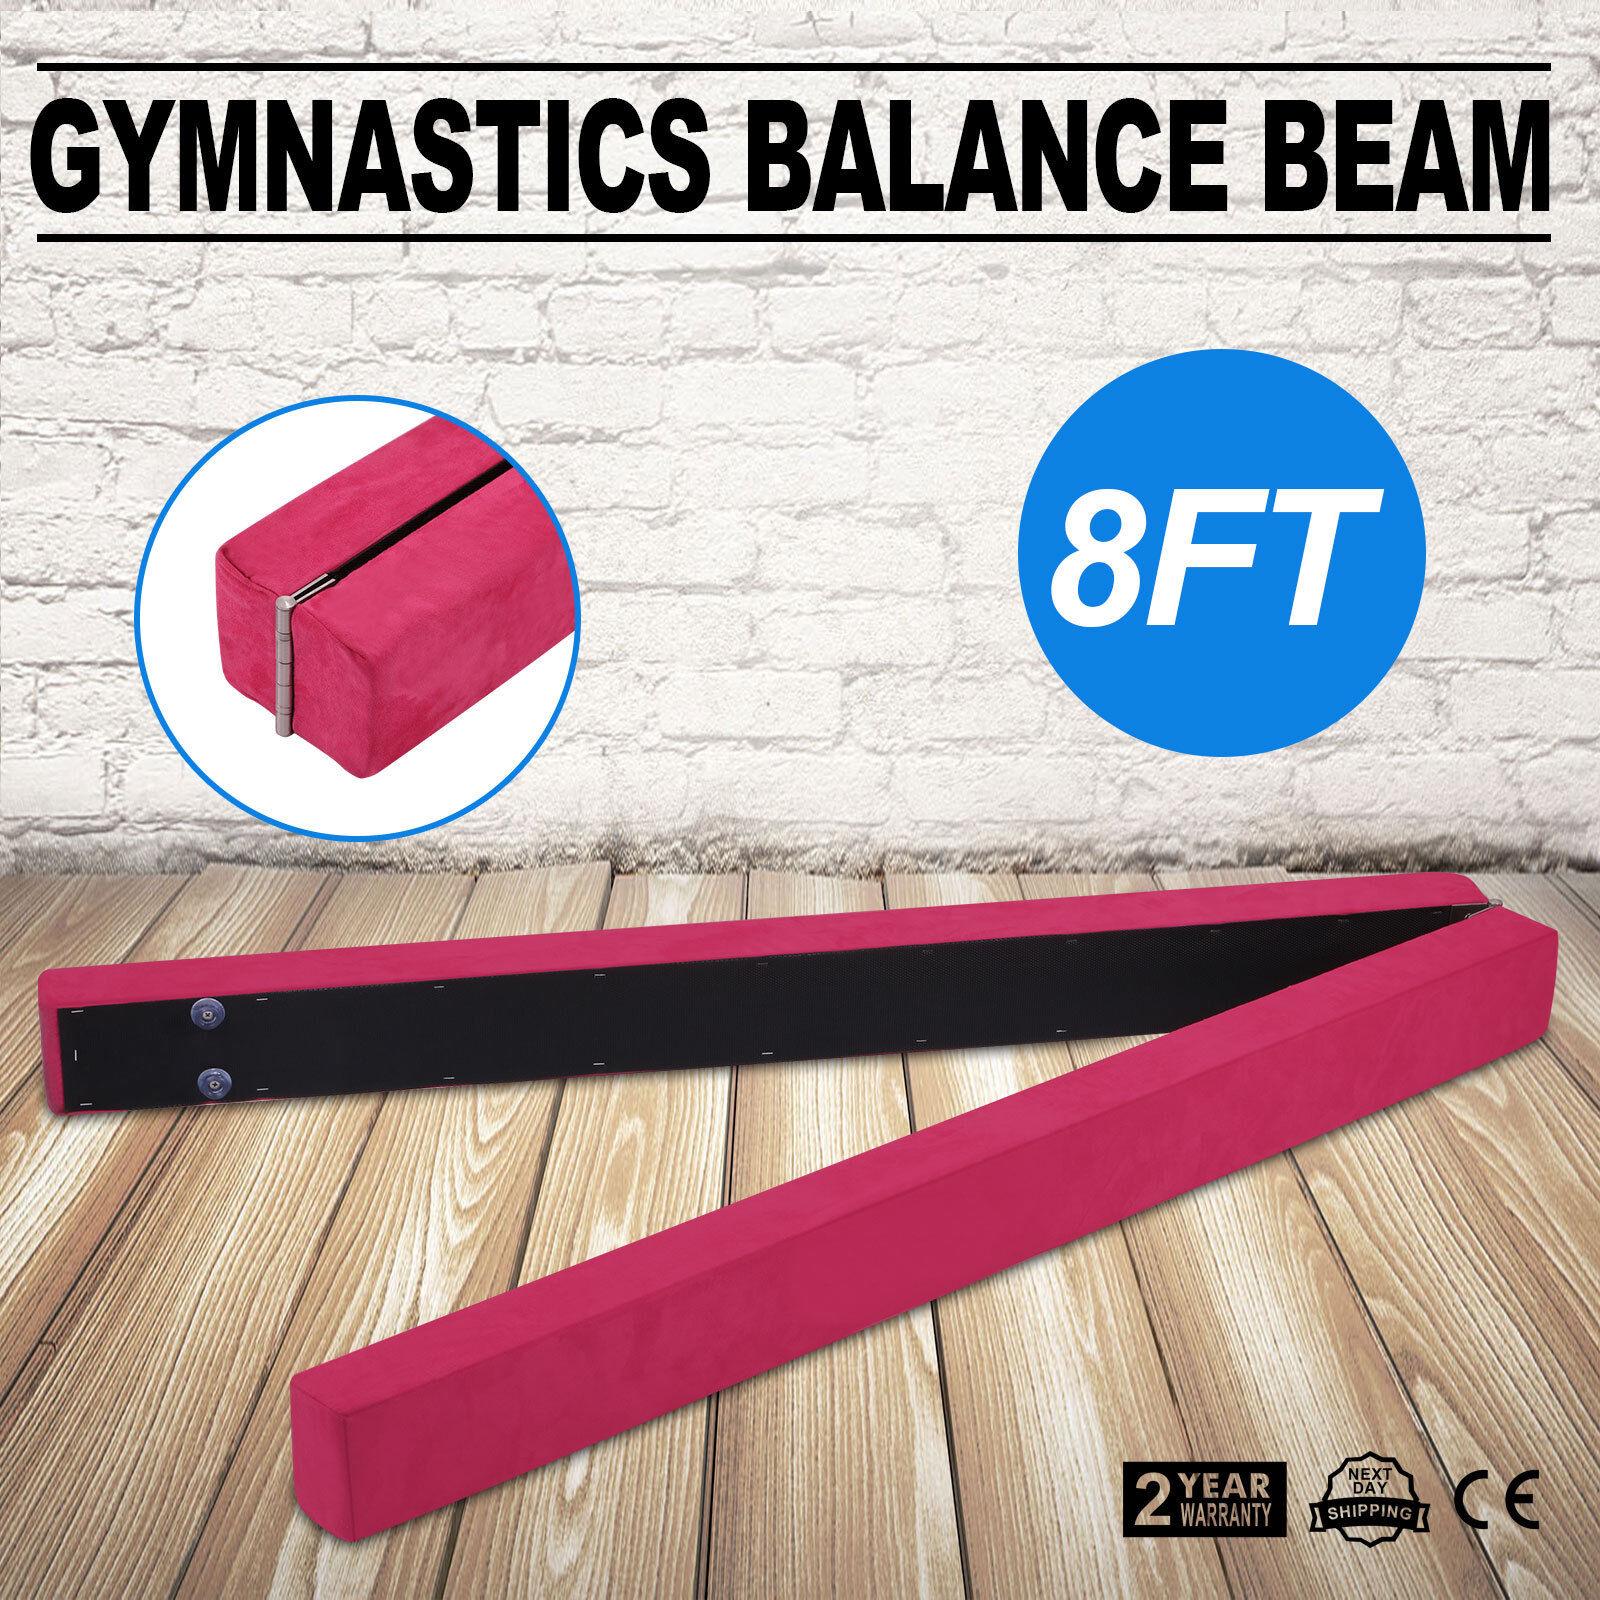 Pink Suede 8FT Gymnastics Folding Balance Beam 2.2M Hard  Wearing Folding Mat  save 50%-75%off